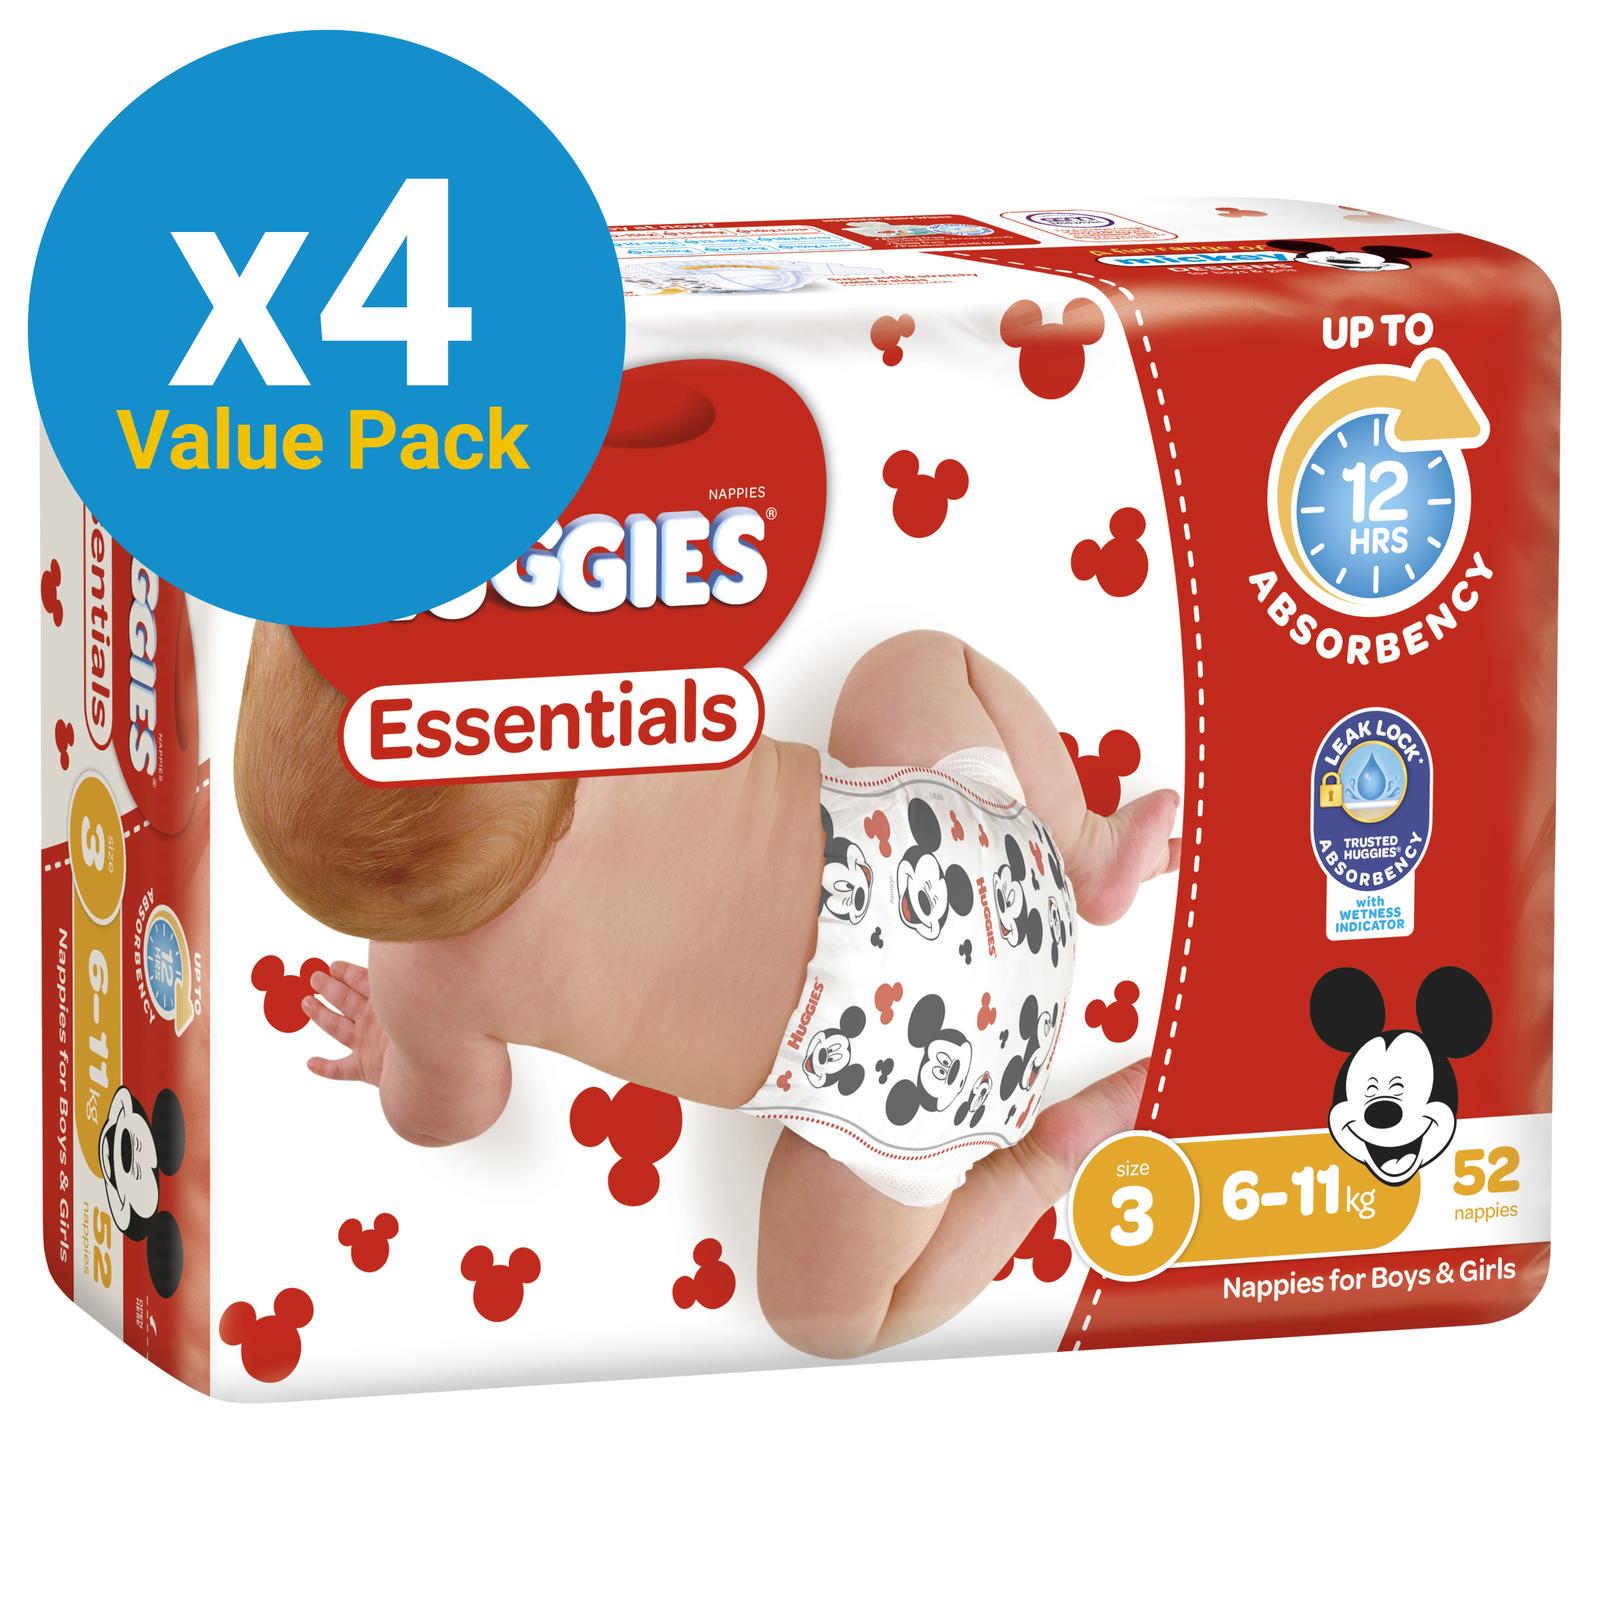 Huggies Essentials Nappies Bulk Value Box - Size 3 Crawler (208) image